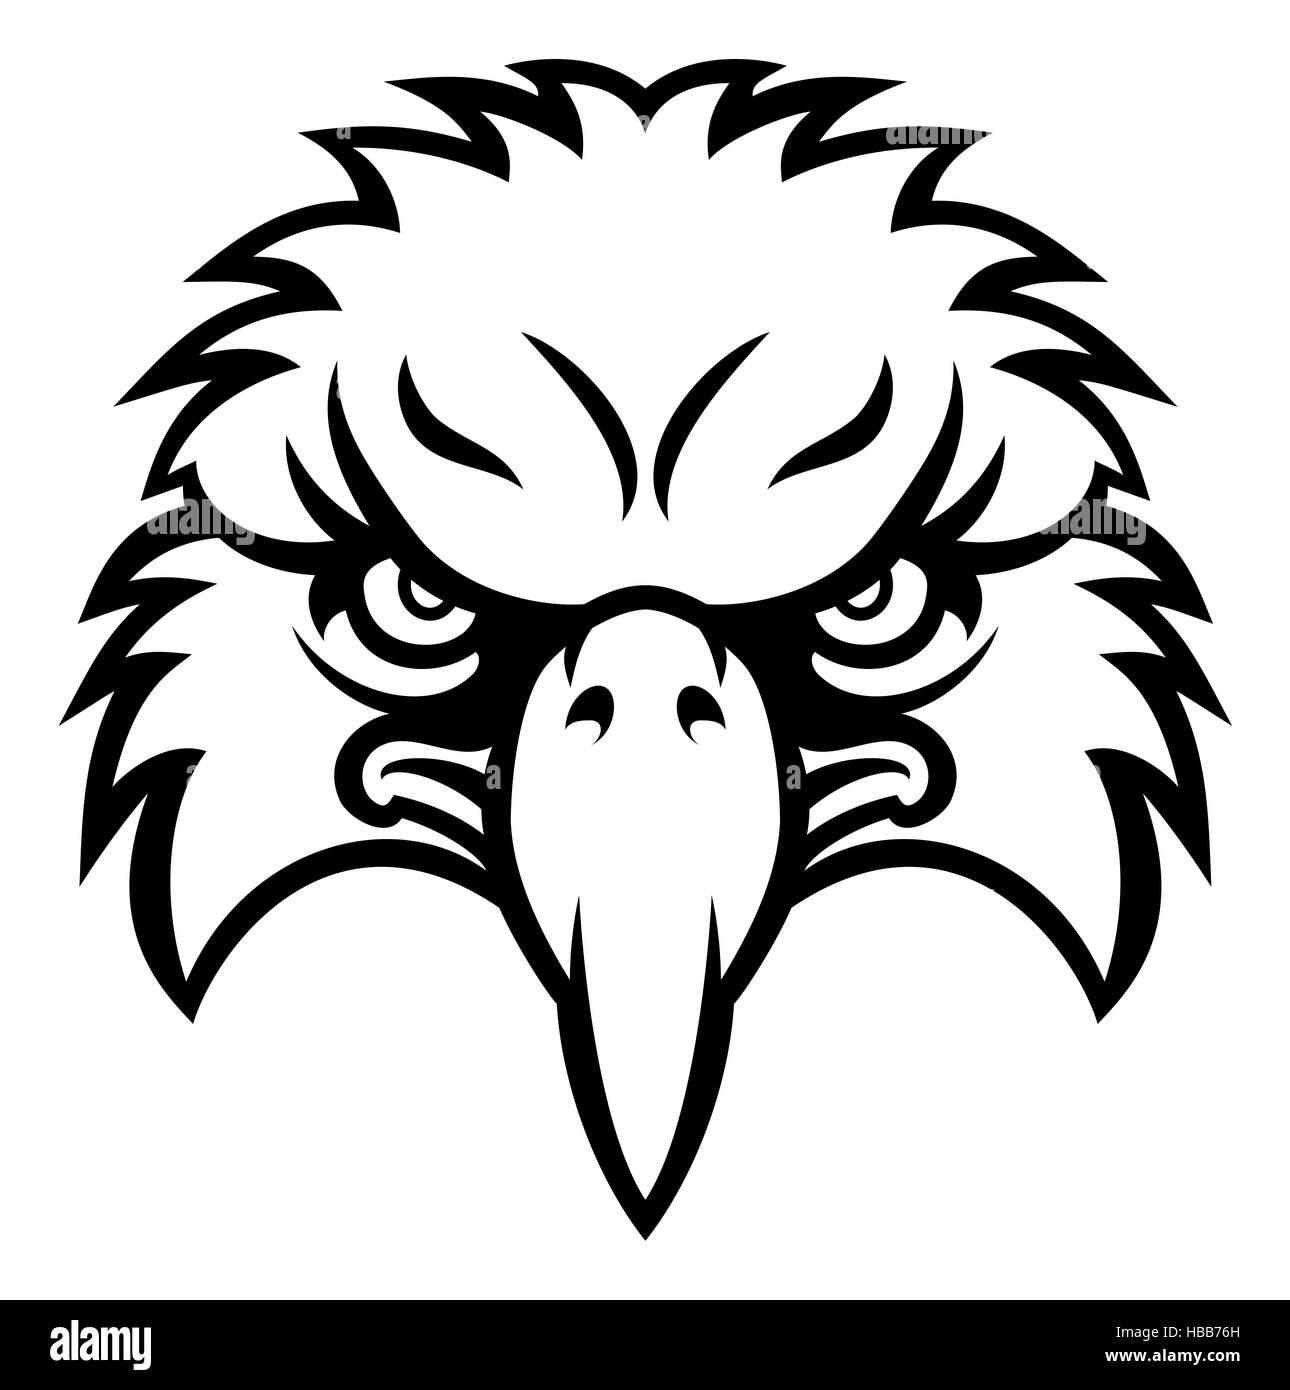 hight resolution of eagle bird character sports mascot head stock image